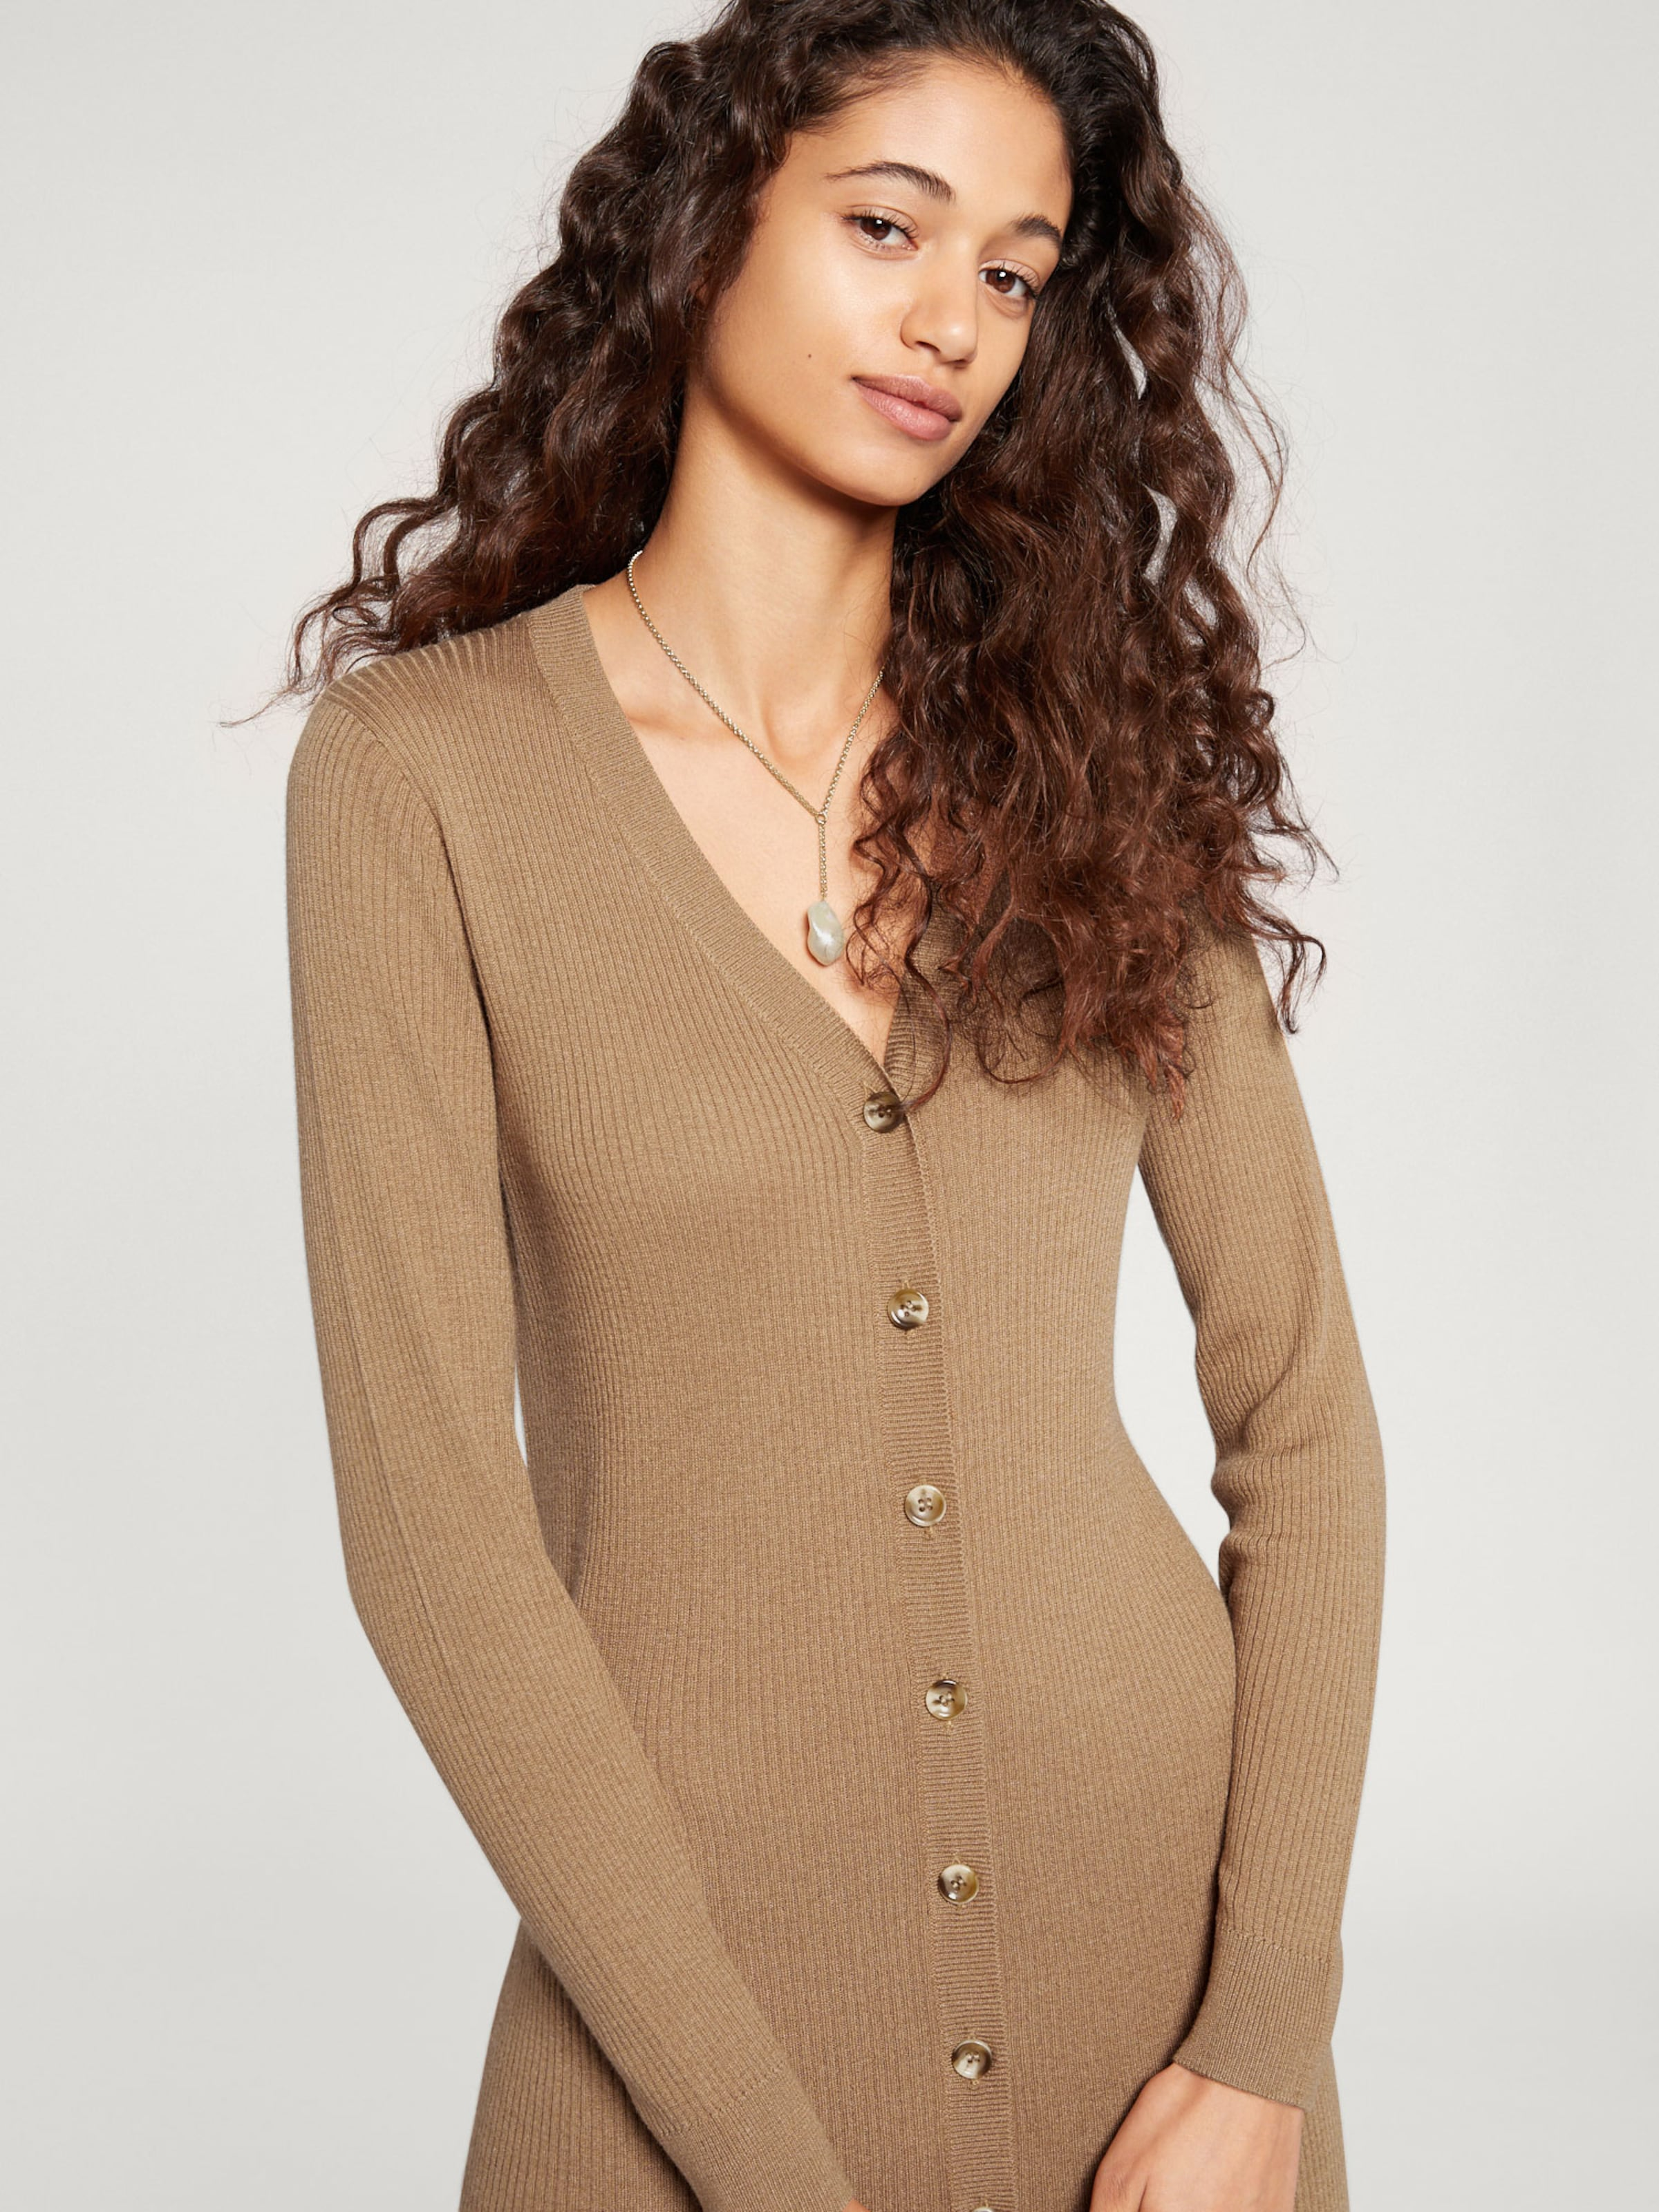 'lora' Robes Edited En Maille Camel xrdCBoe